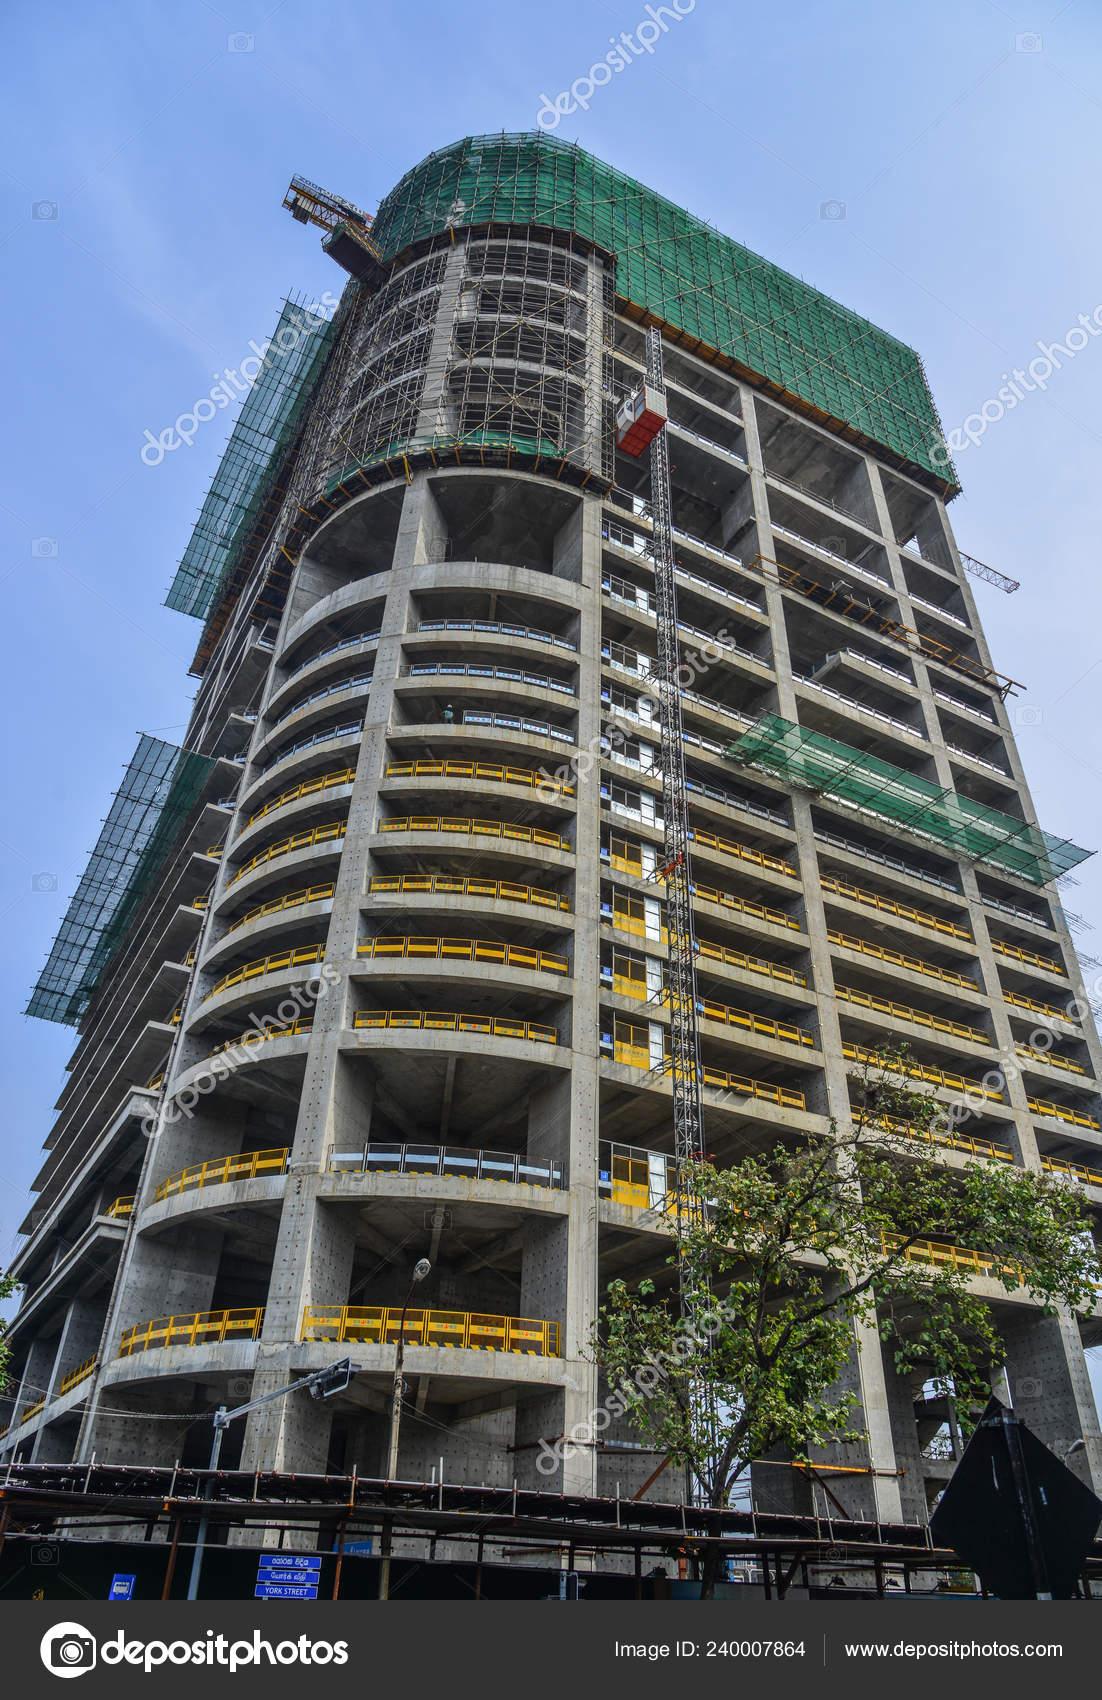 Colombo Sri Lanka Dec 2018 Construction Site Colombo Sri